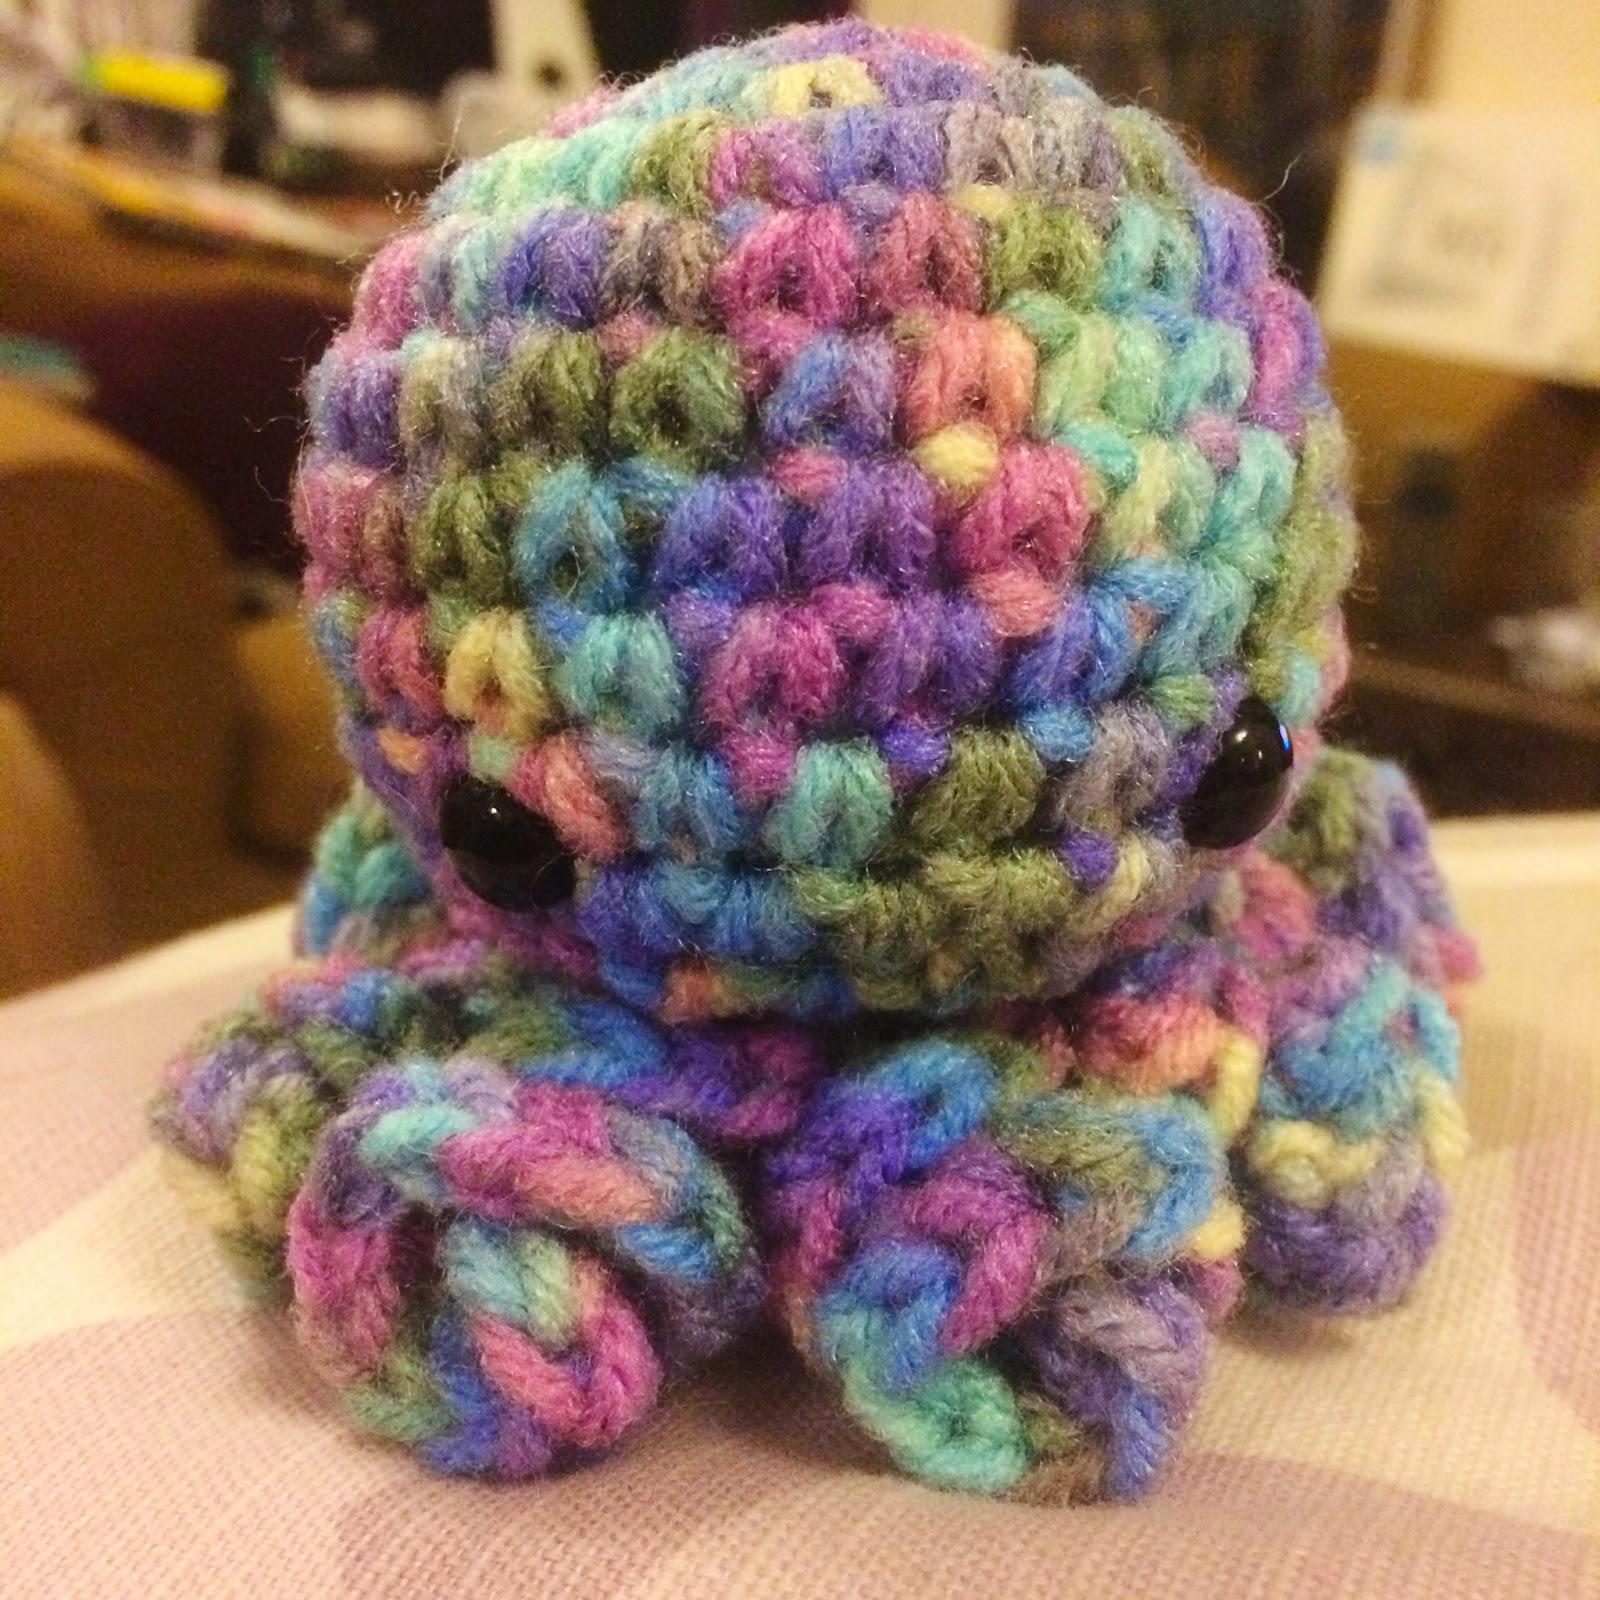 13 Crochet Octopus Patterns   The Crochet Crowd   1600x1600